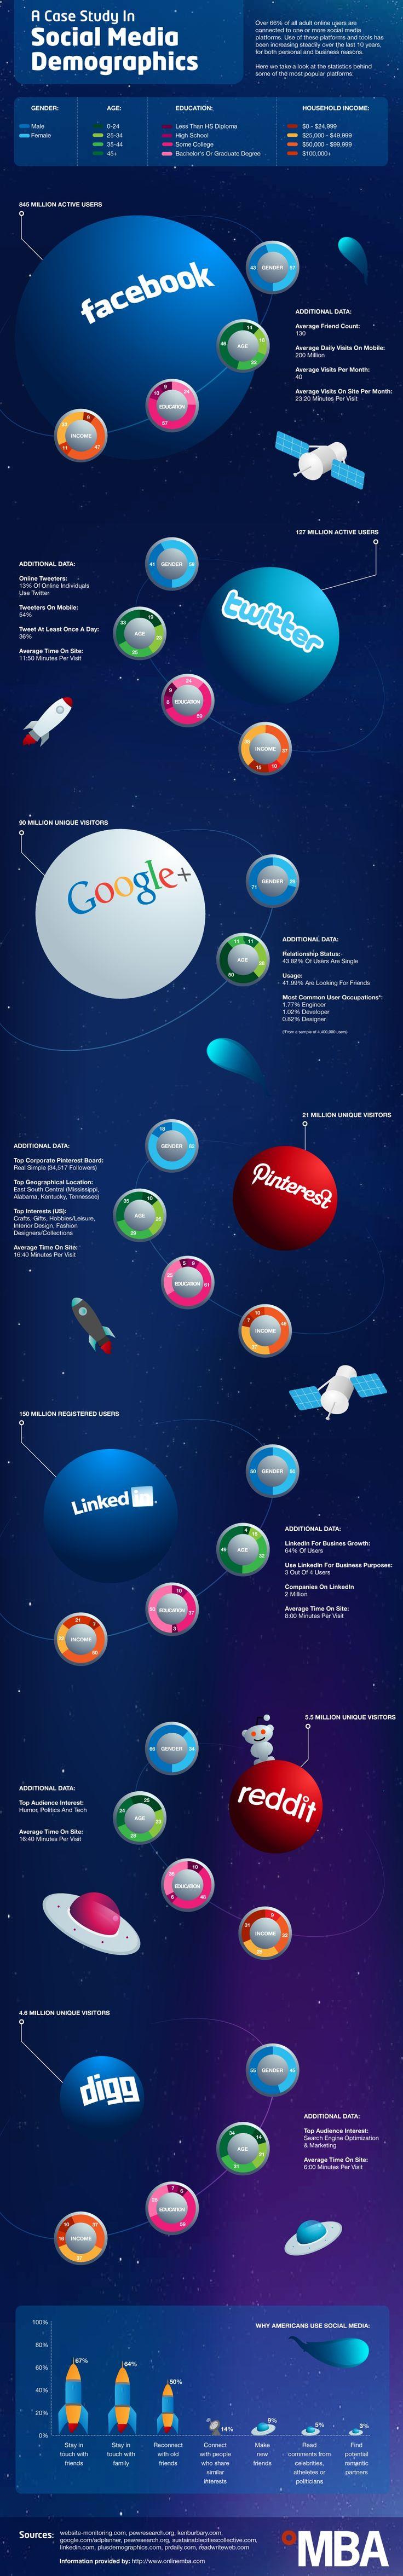 Social Demographics: Who's Using Today's Biggest Networks via @Mashable